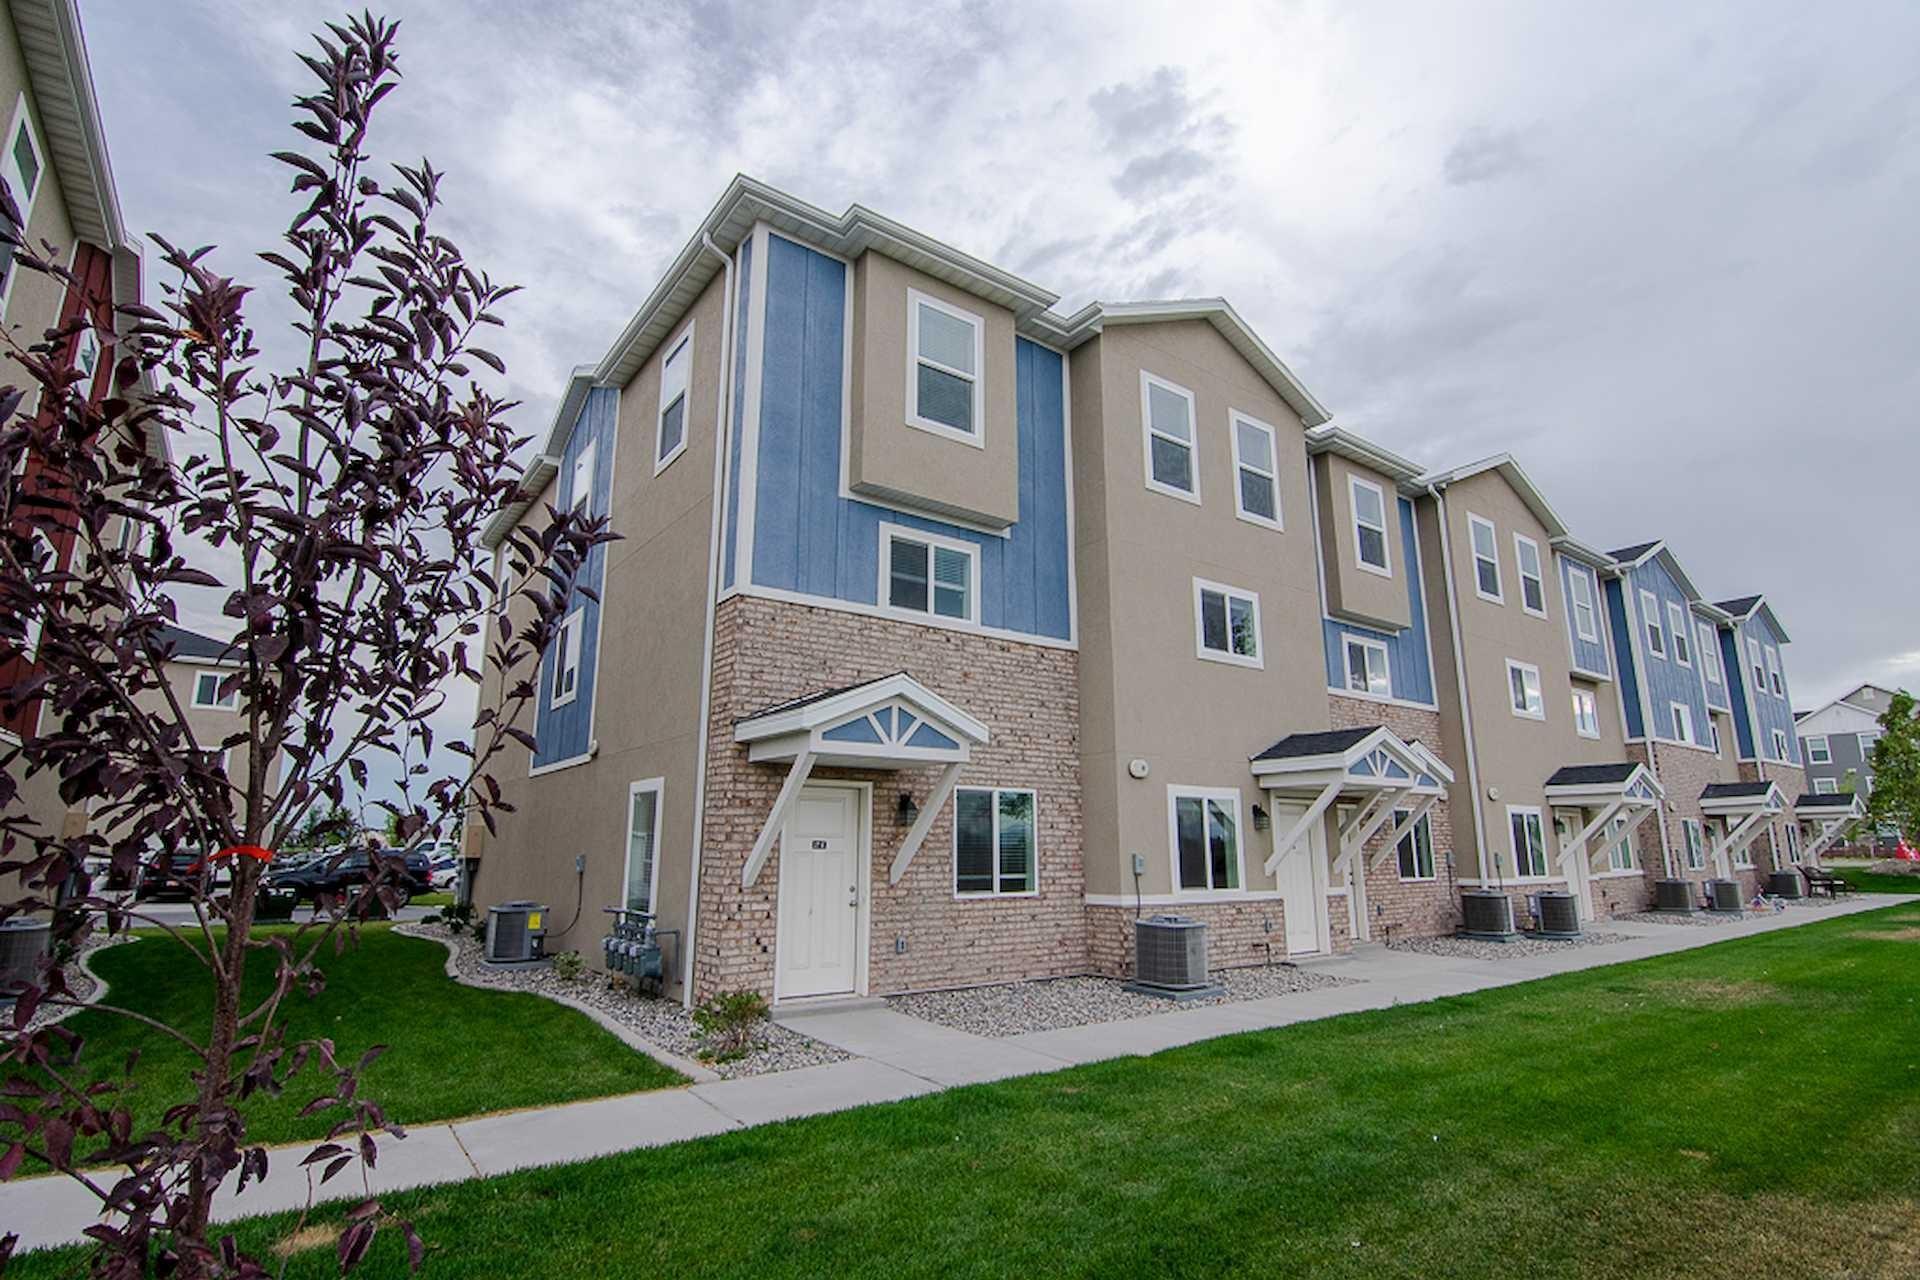 A FIG fourplex development in Utah County